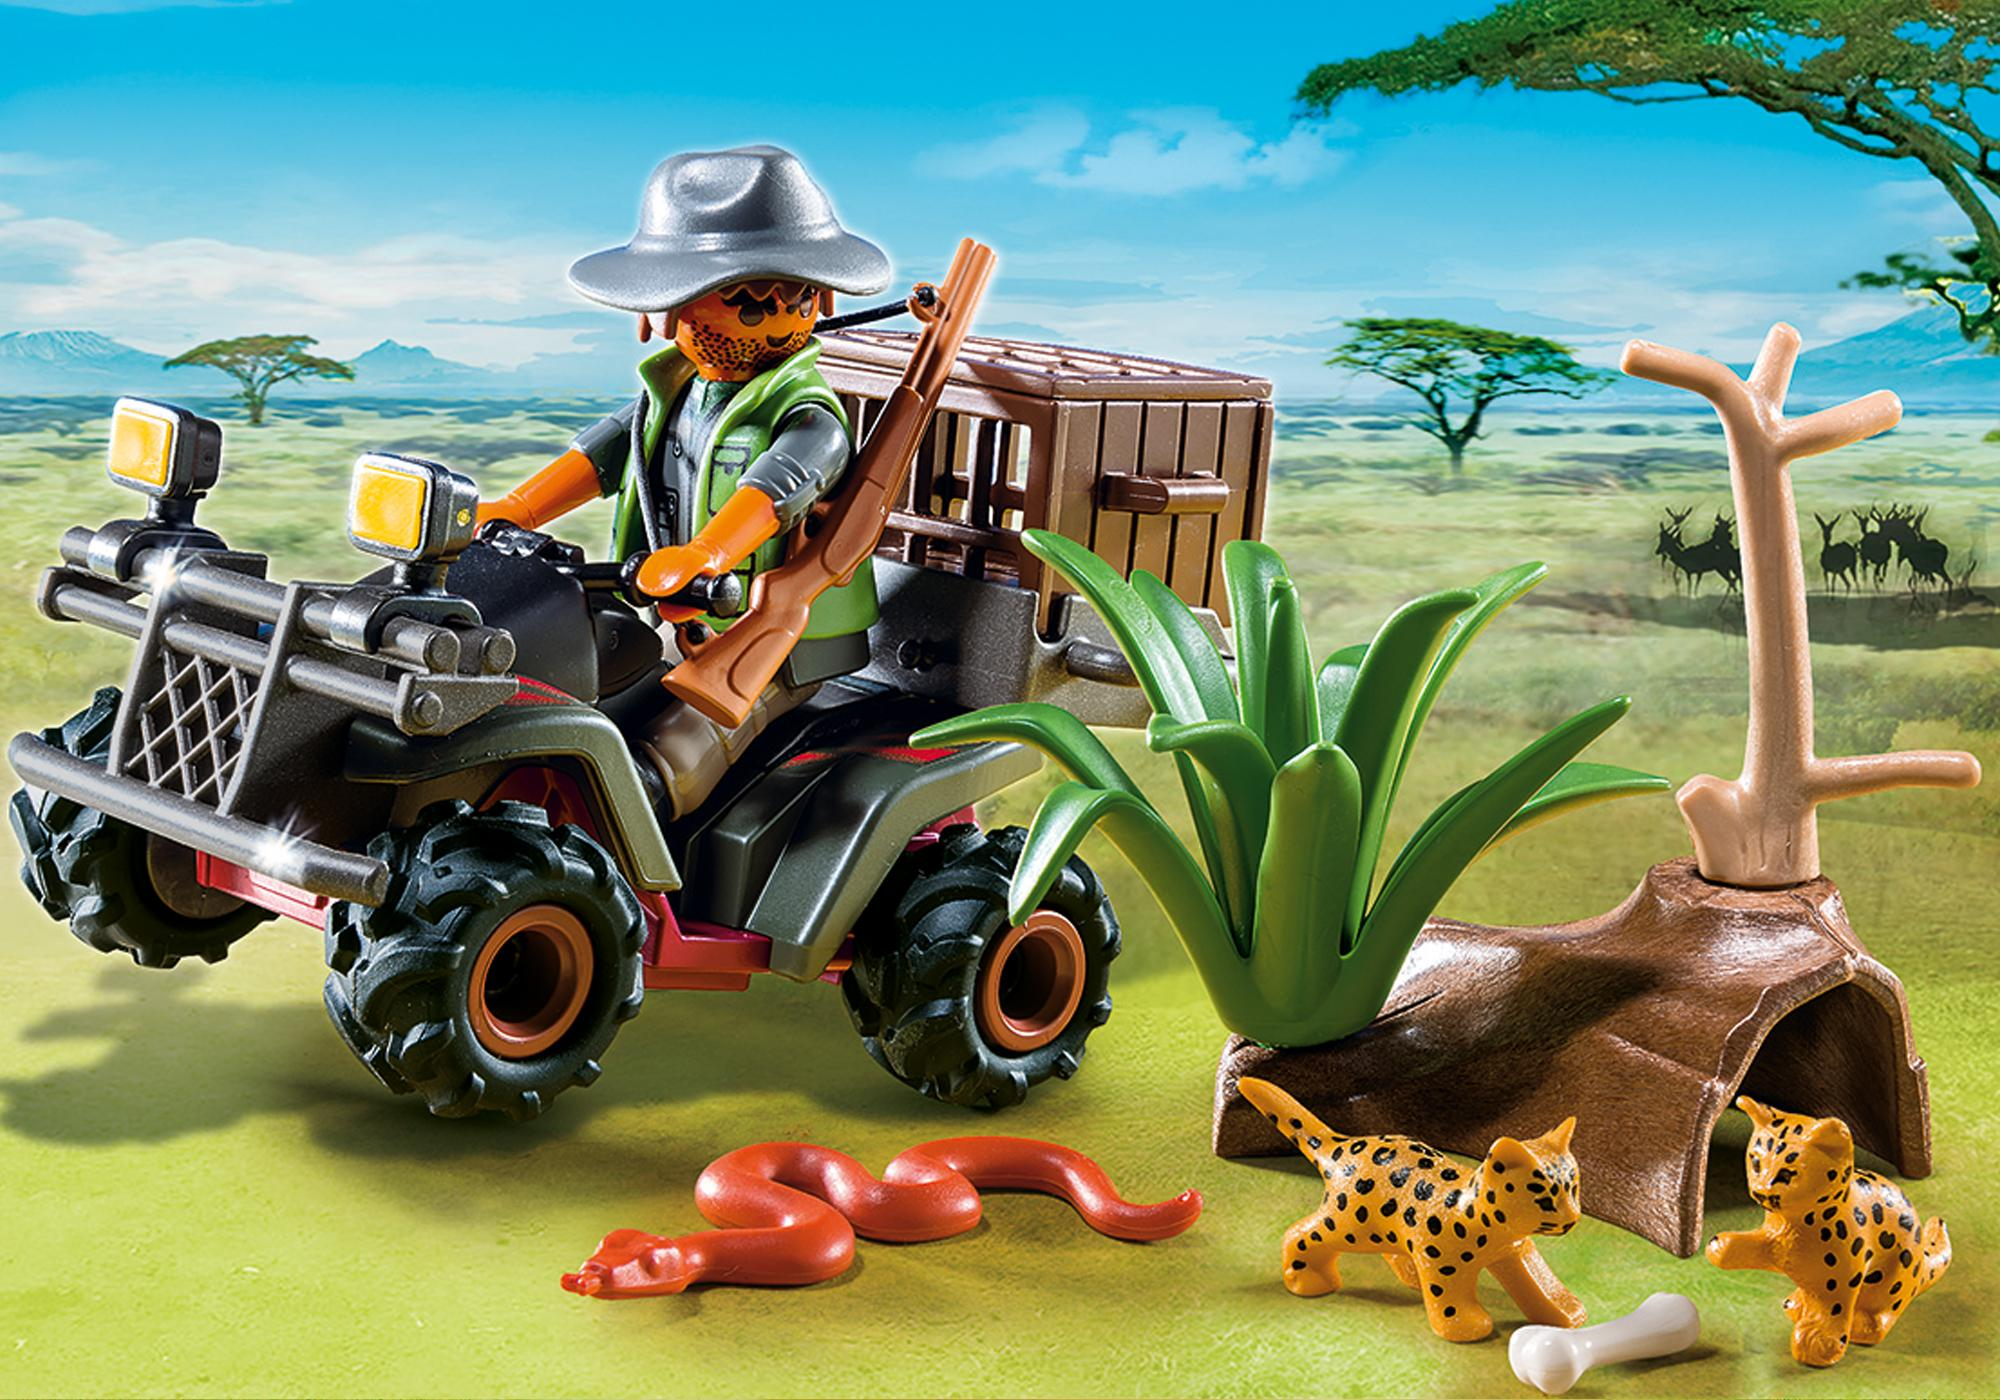 http://media.playmobil.com/i/playmobil/6939_product_detail/Evil Explorer with Quad